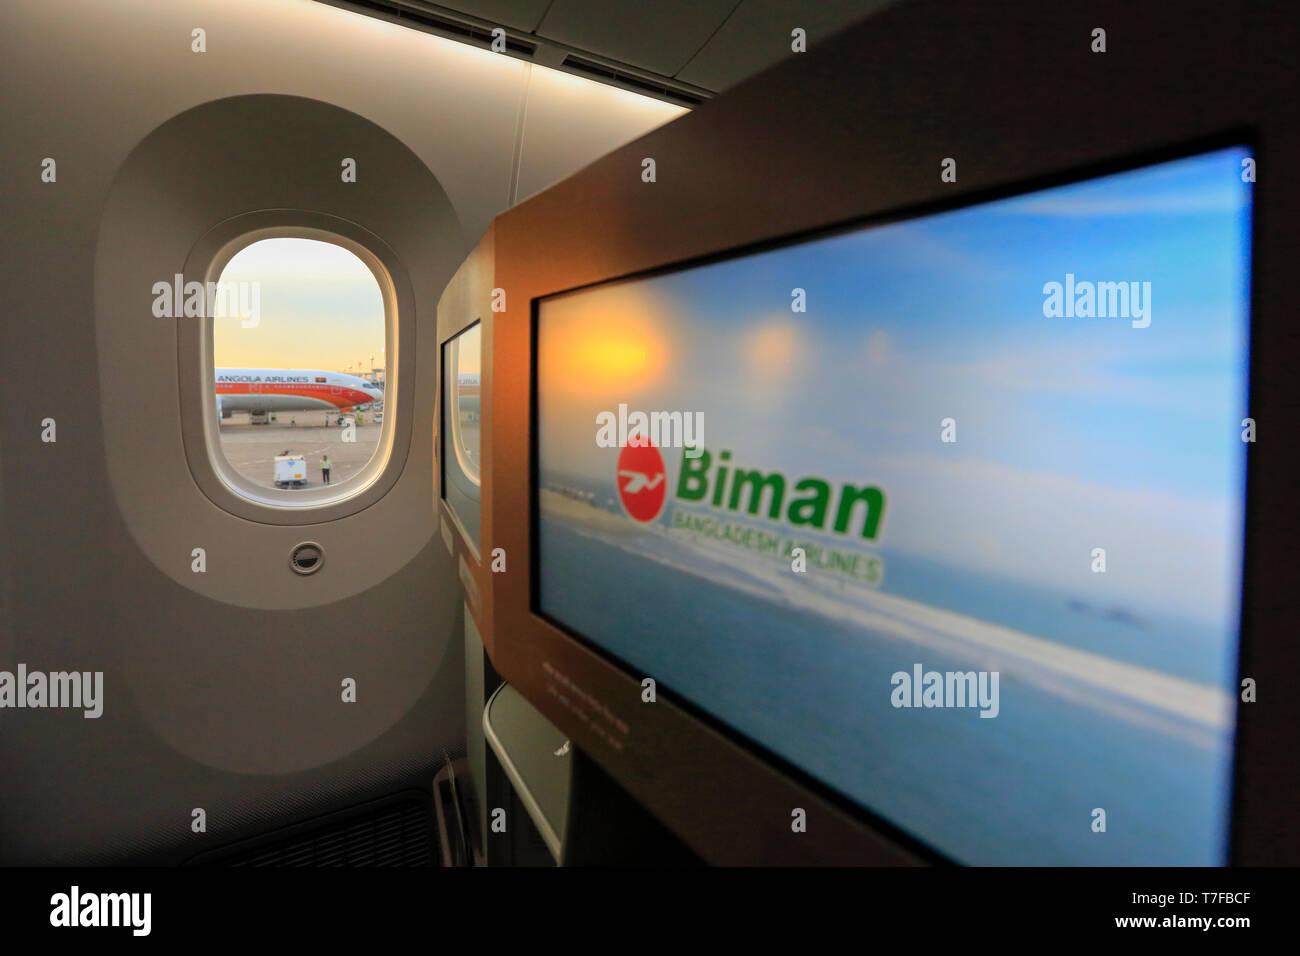 Boeing 787 Dreamliner Interior Stock Photos & Boeing 787 Dreamliner